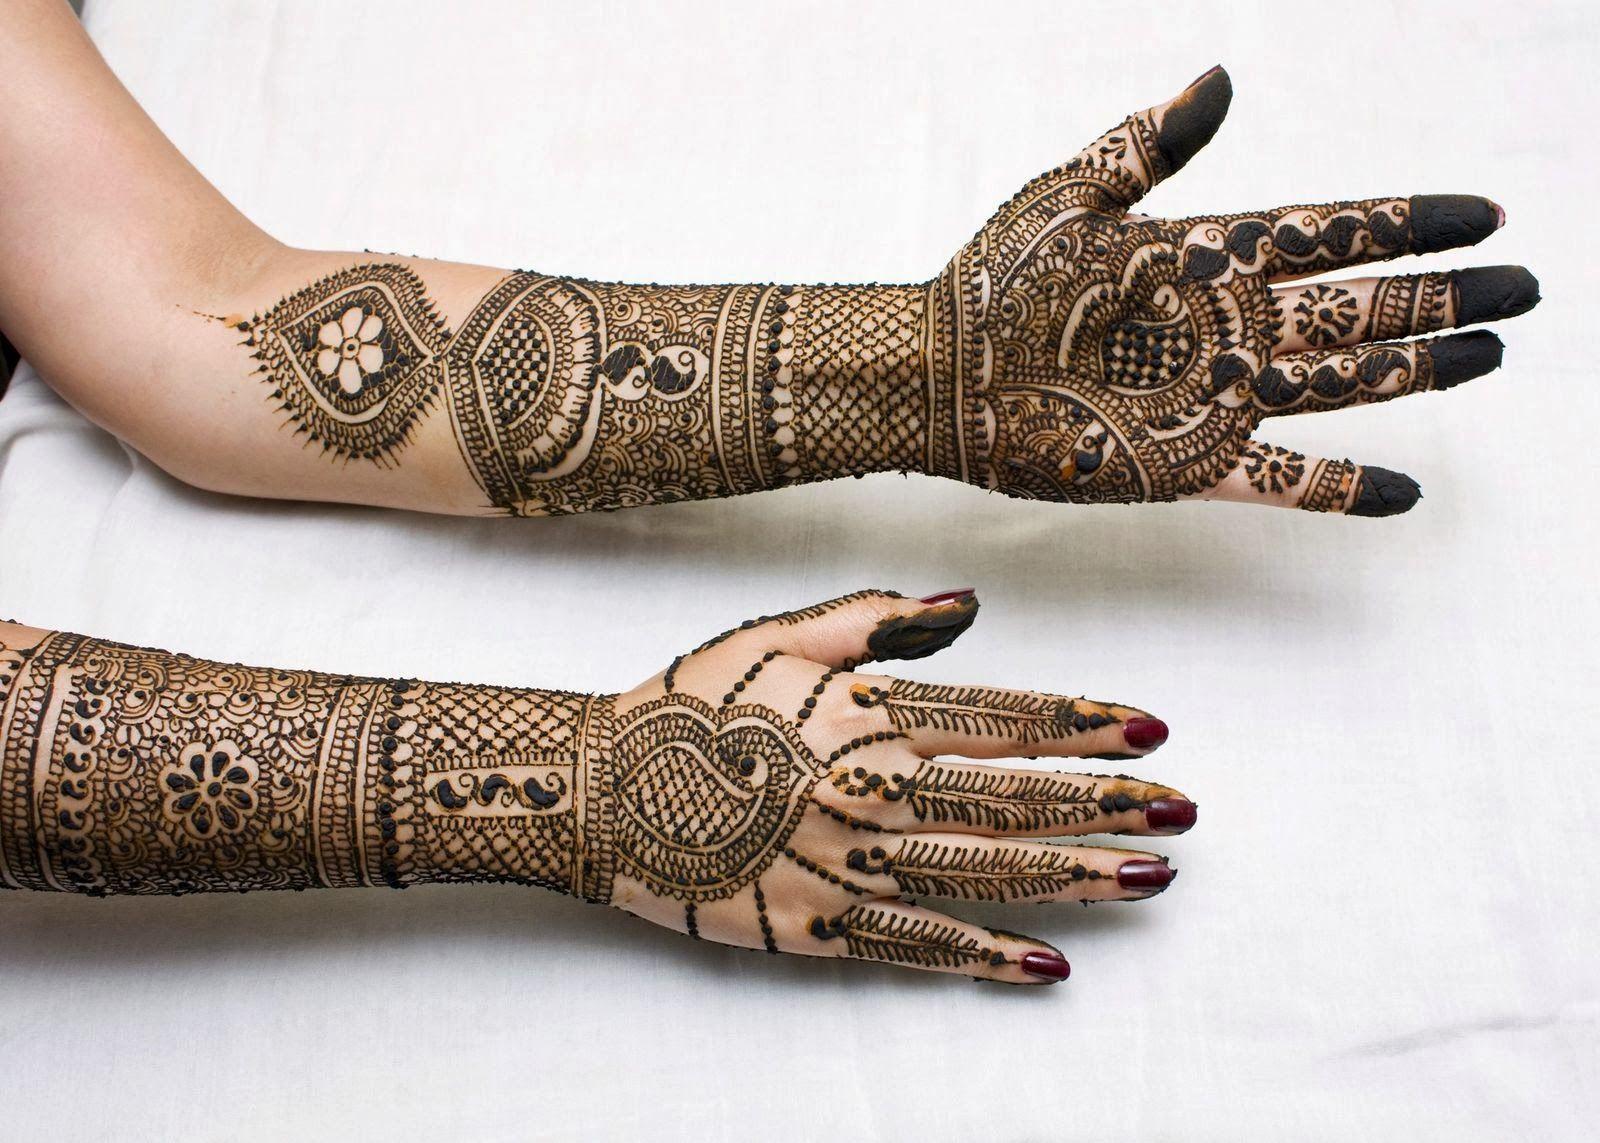 Attractive dulhan henna mehndi design for full hand - Attractive Mehandi Designs For A Lovely Bride Mehandidesign Indianmehandidesign Arabicmehandidesign